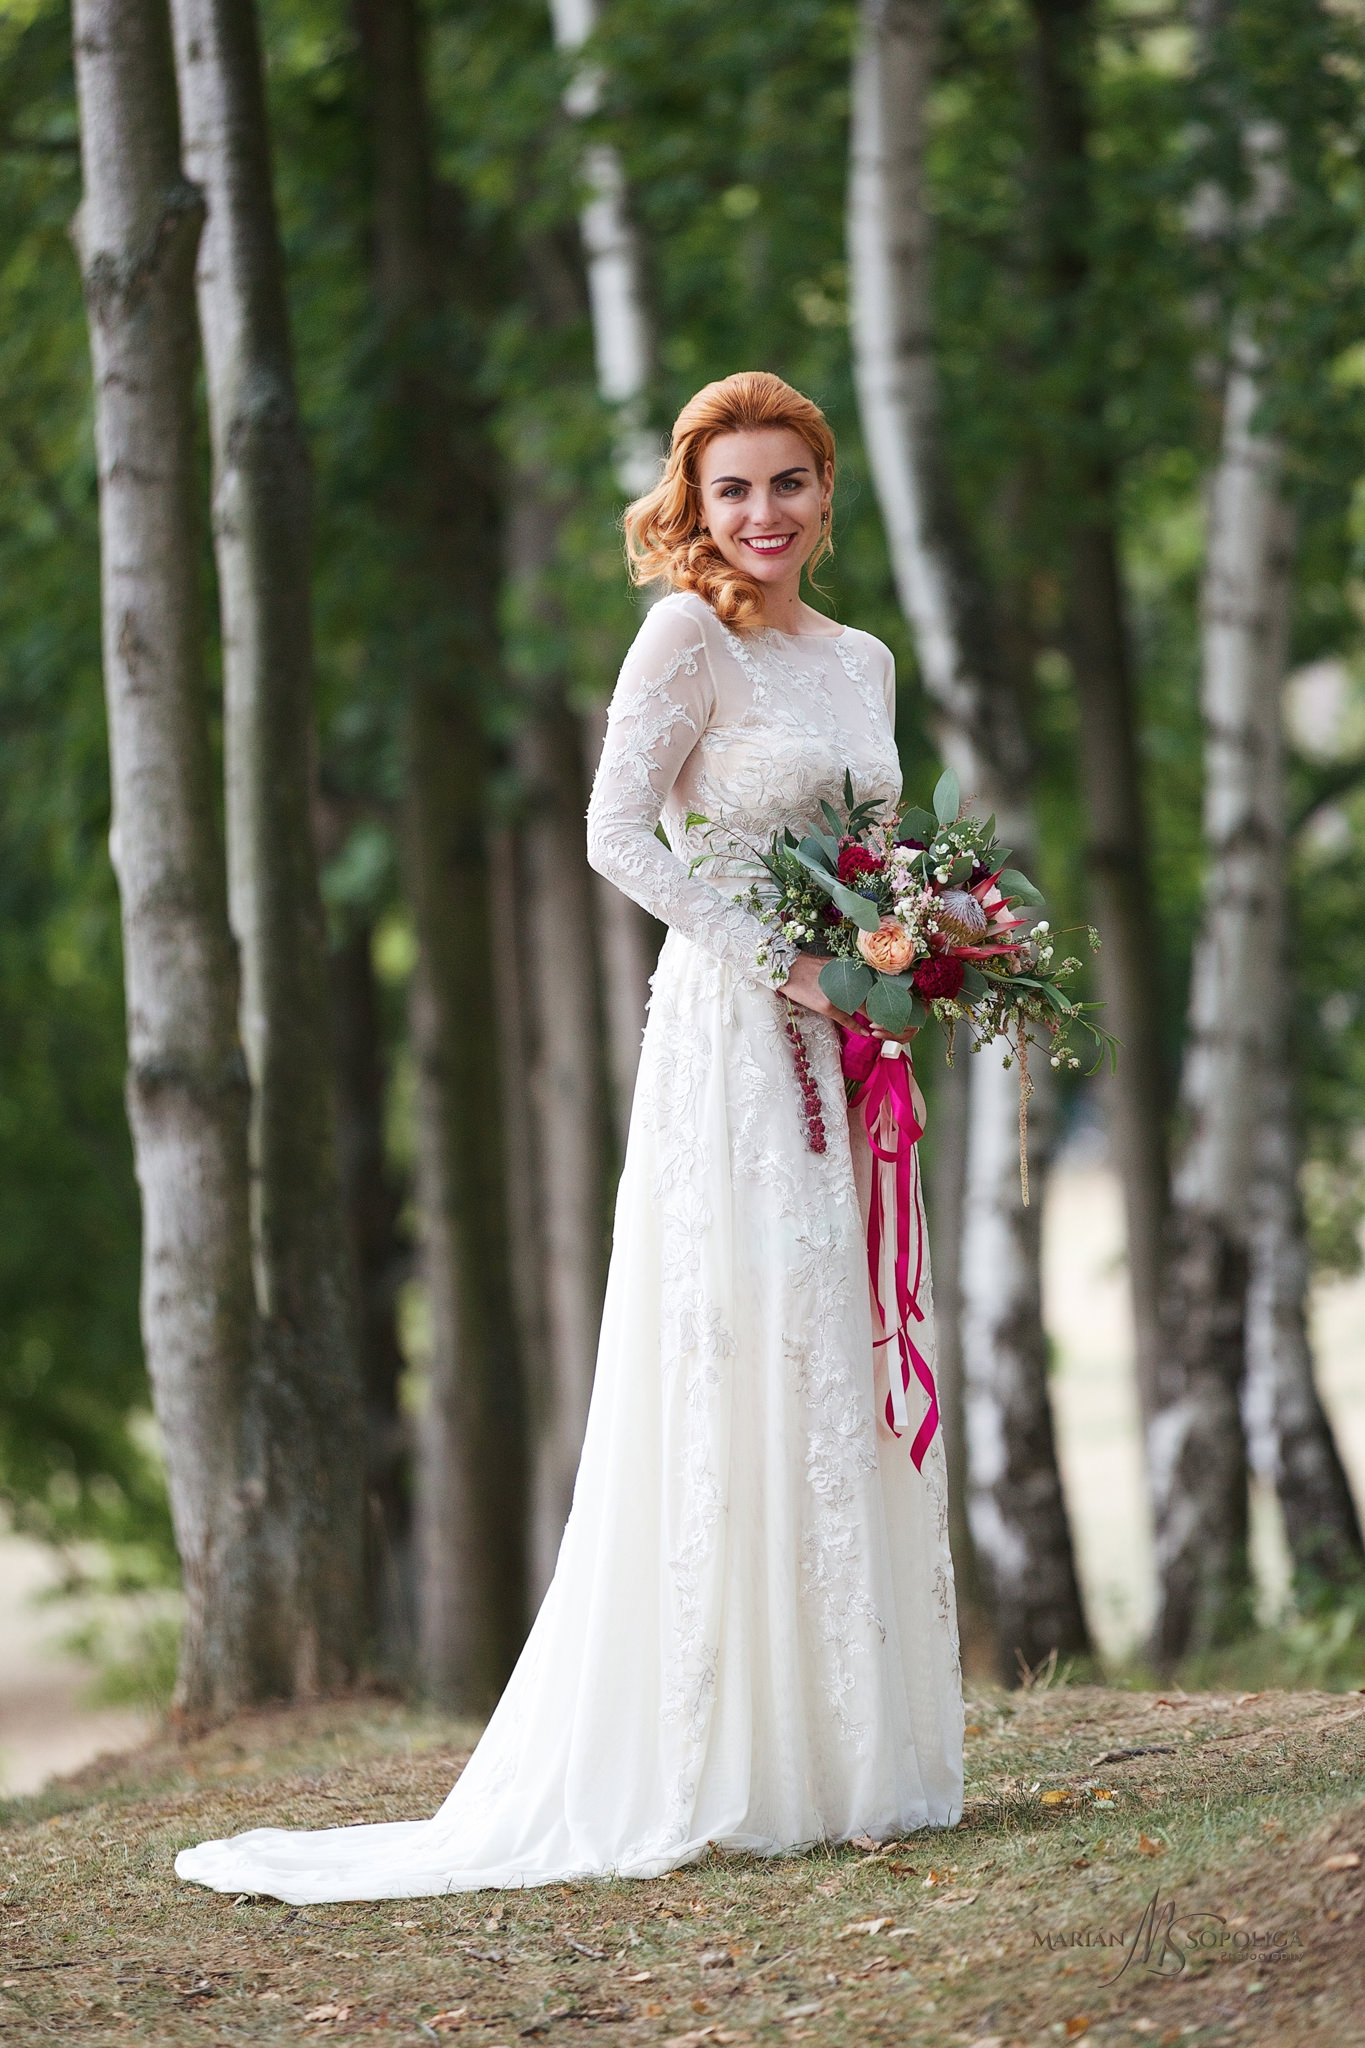 fotografovani-svatby-na-brnenske-prehrade-svatebni-portret-neves